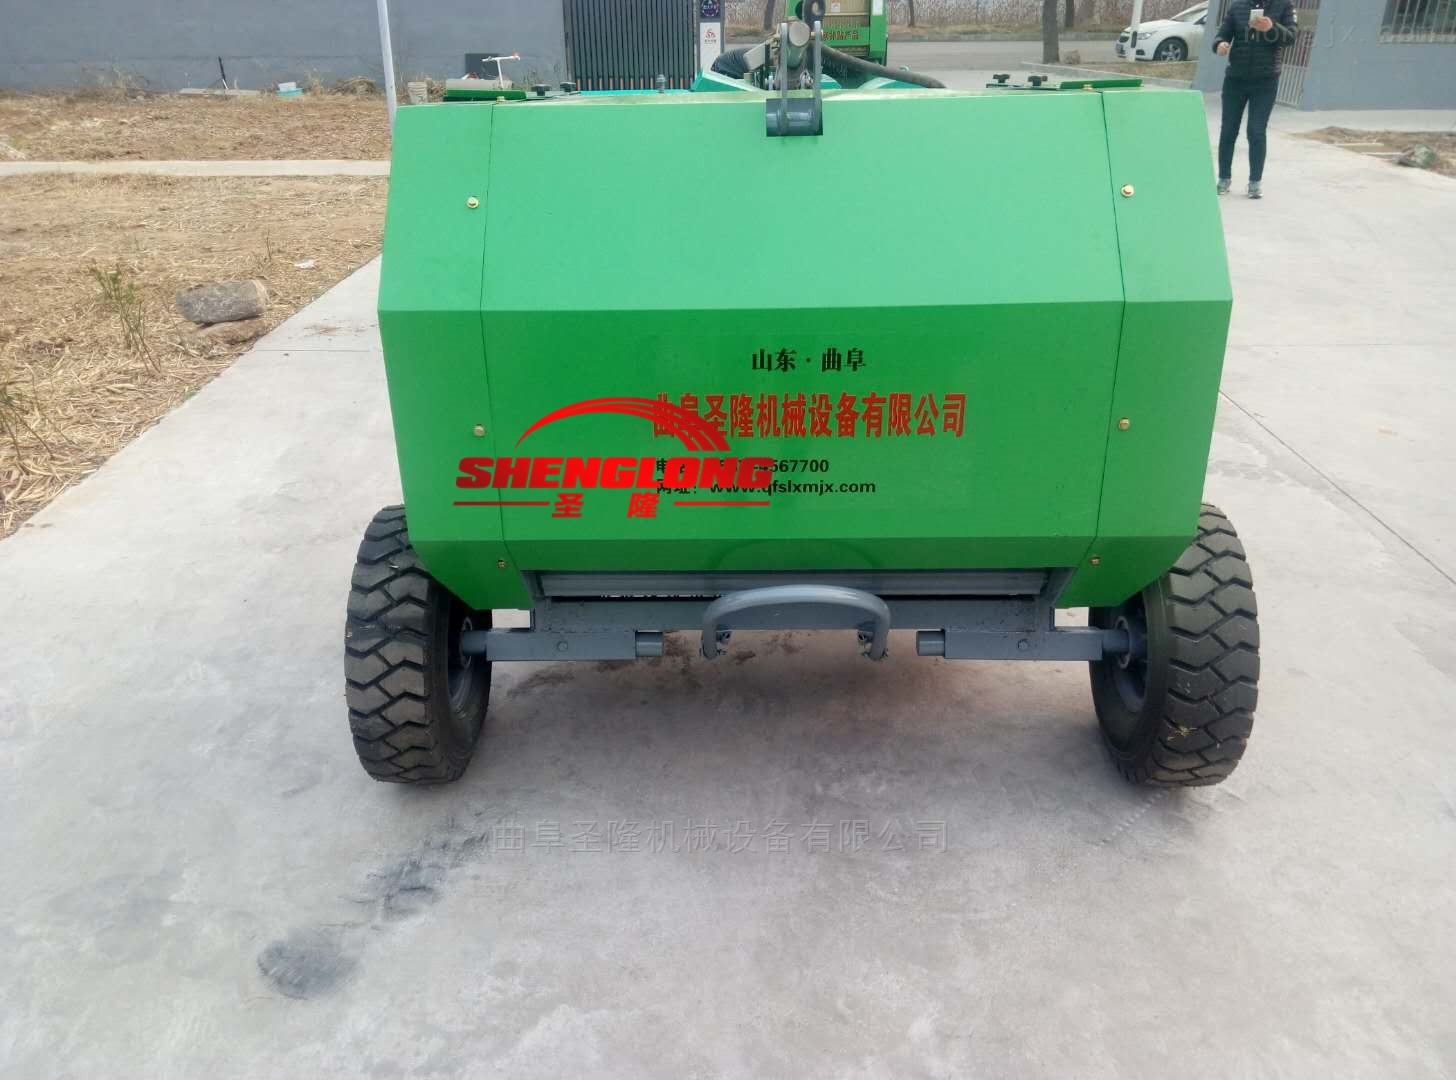 SL5080-拖拉机带动牵引悬挂两用小麦秸秆捡拾打捆机